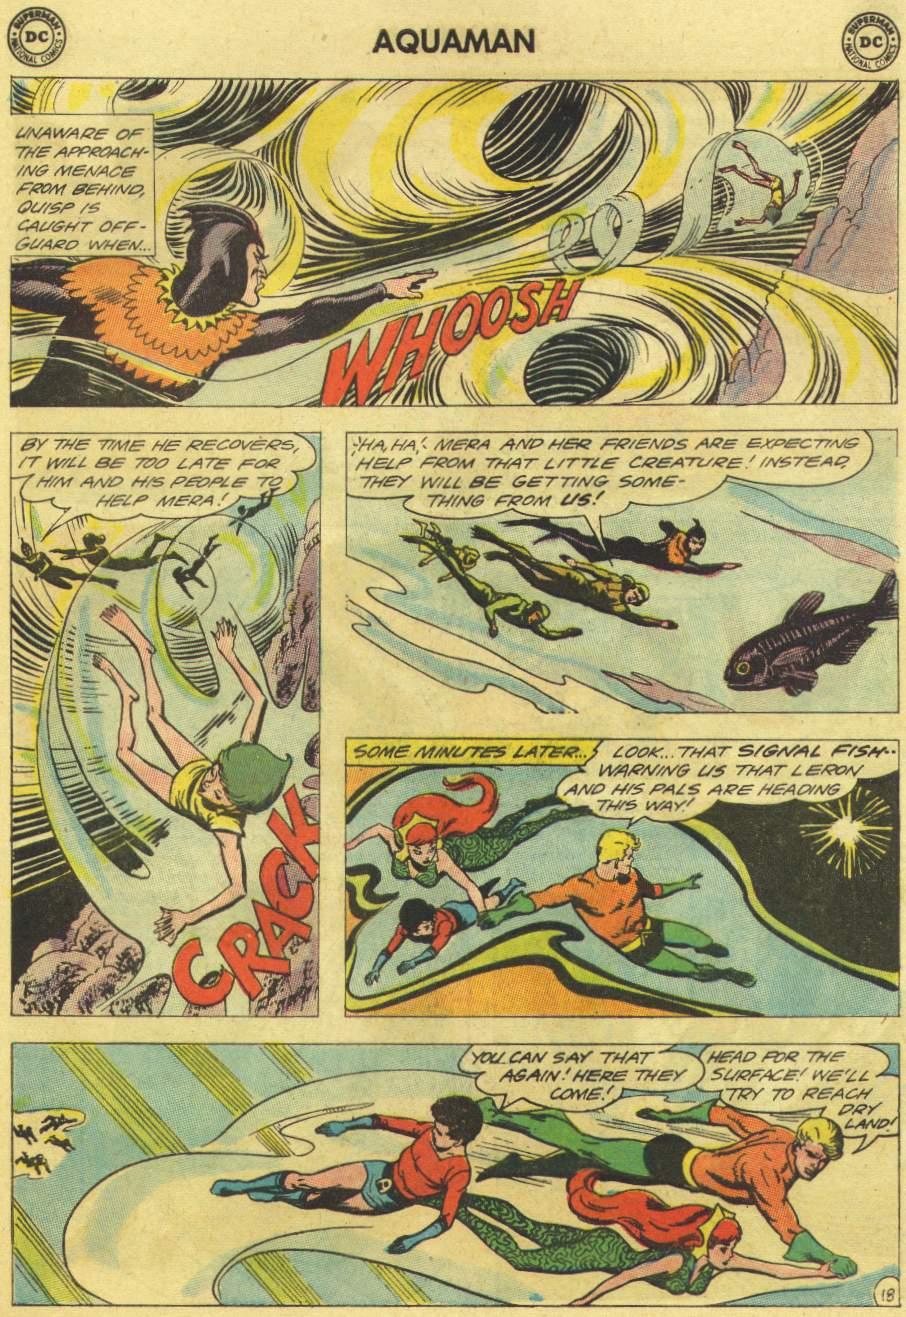 Read online Aquaman (1962) comic -  Issue #11 - 25